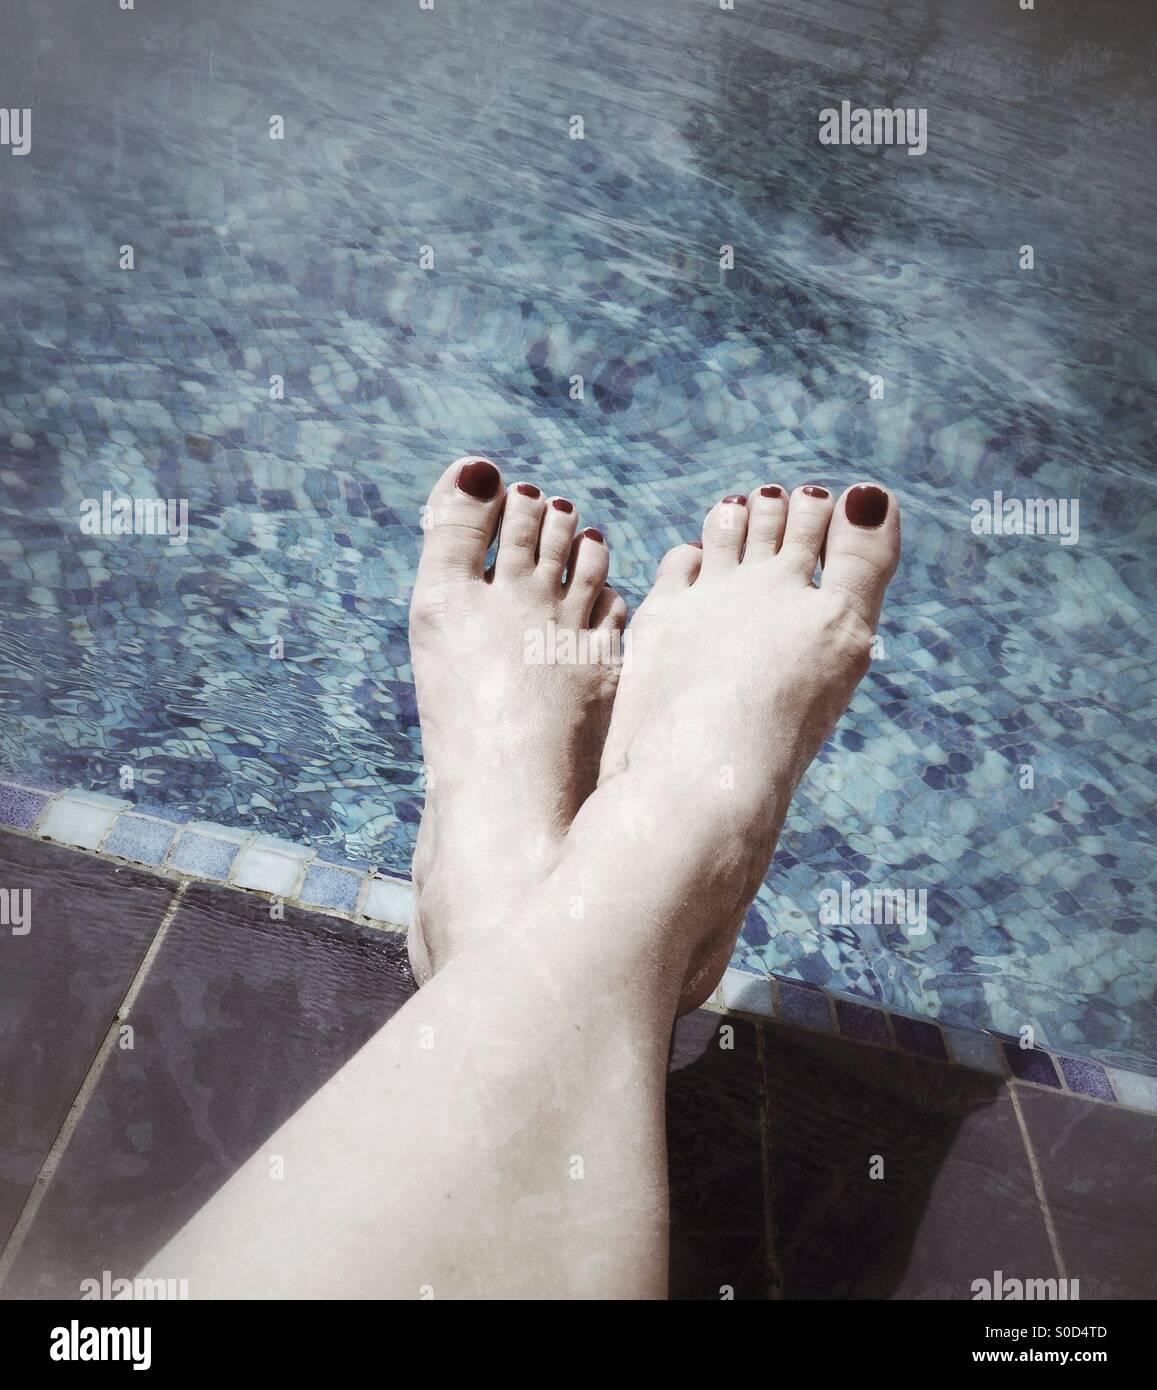 Feet resting - Stock Image